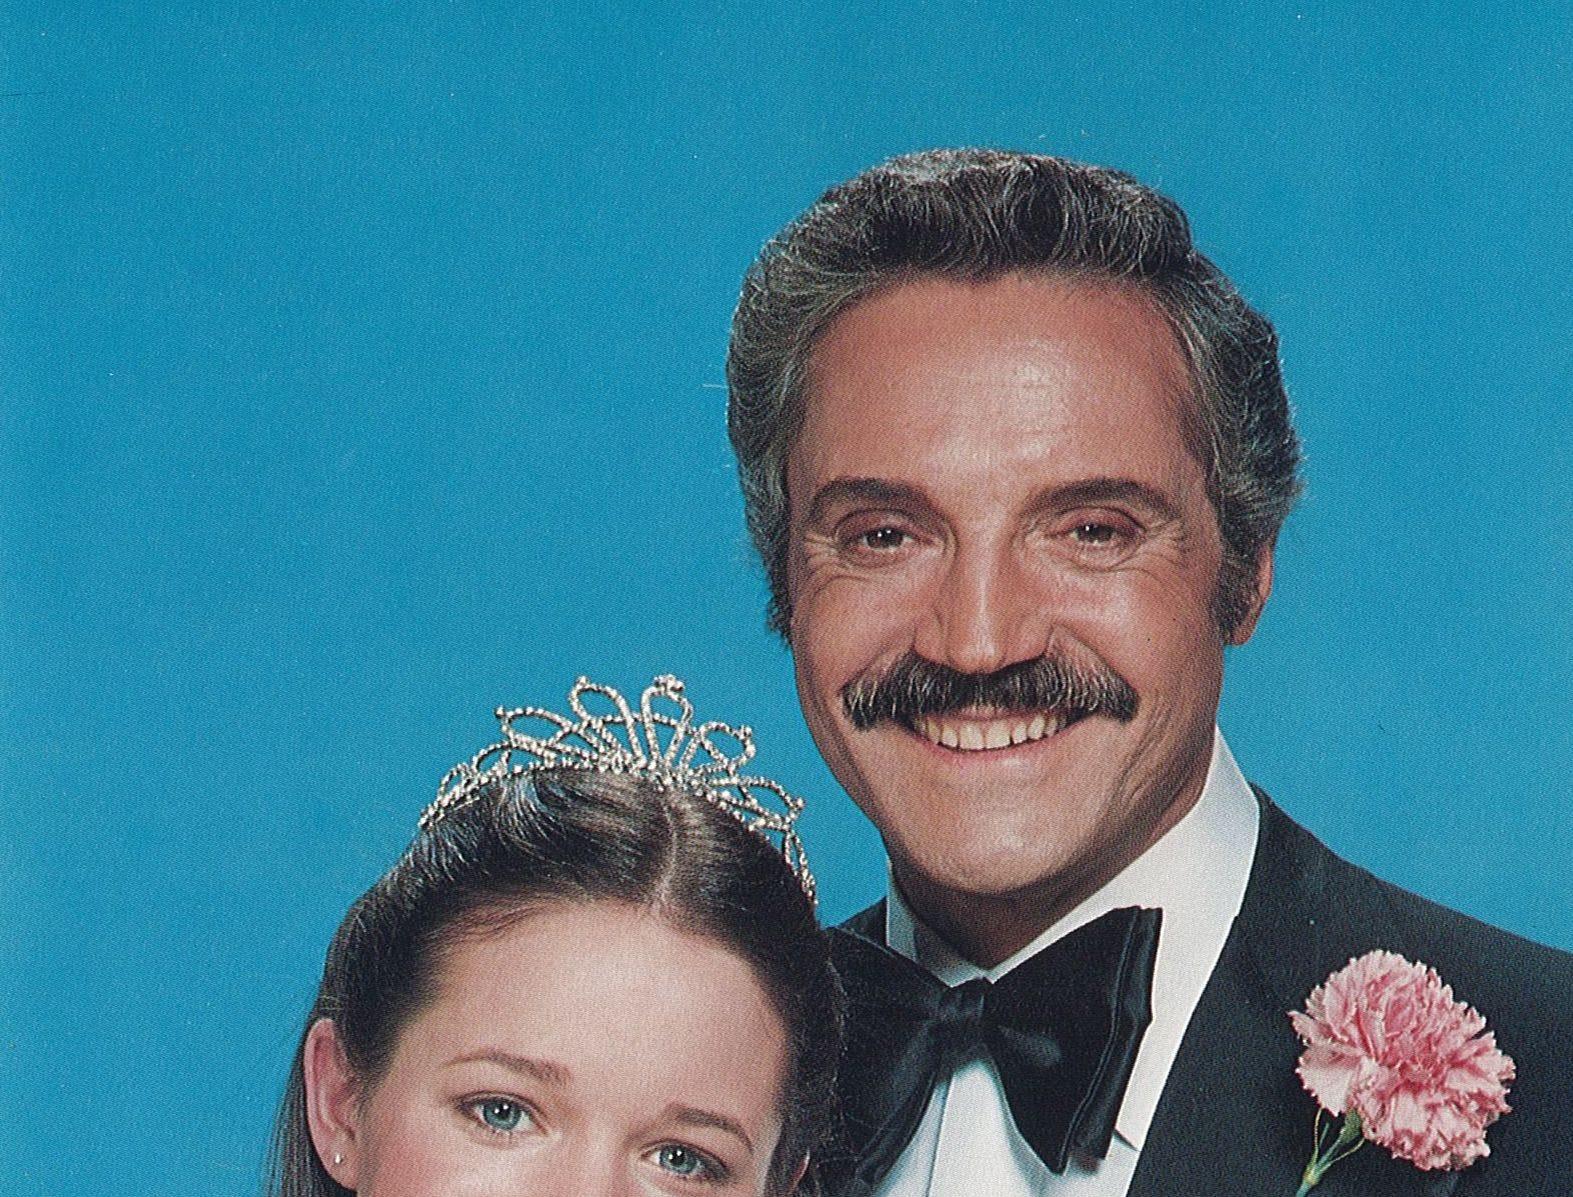 Kim Crosby in America's Junior Miss